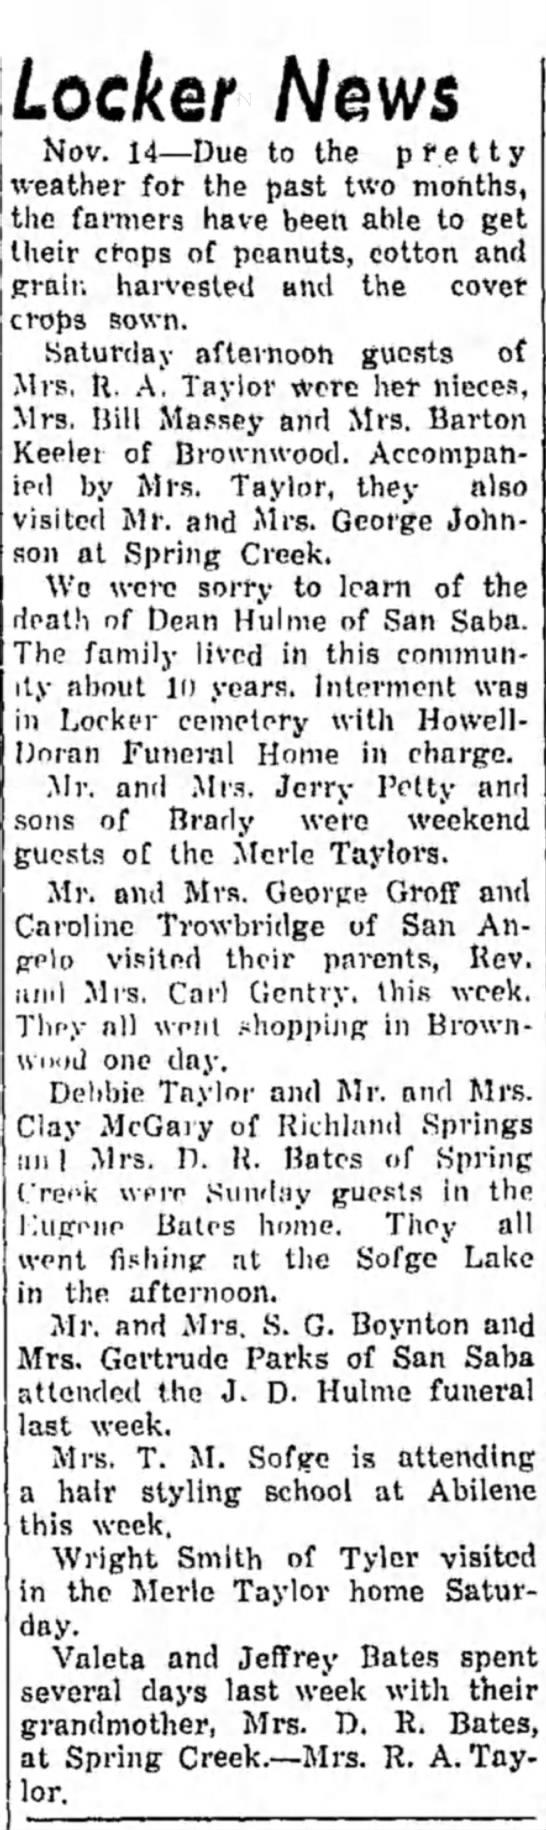 The San Saba News and Star 17 Nov 1966 Pg. 5 Locker News -